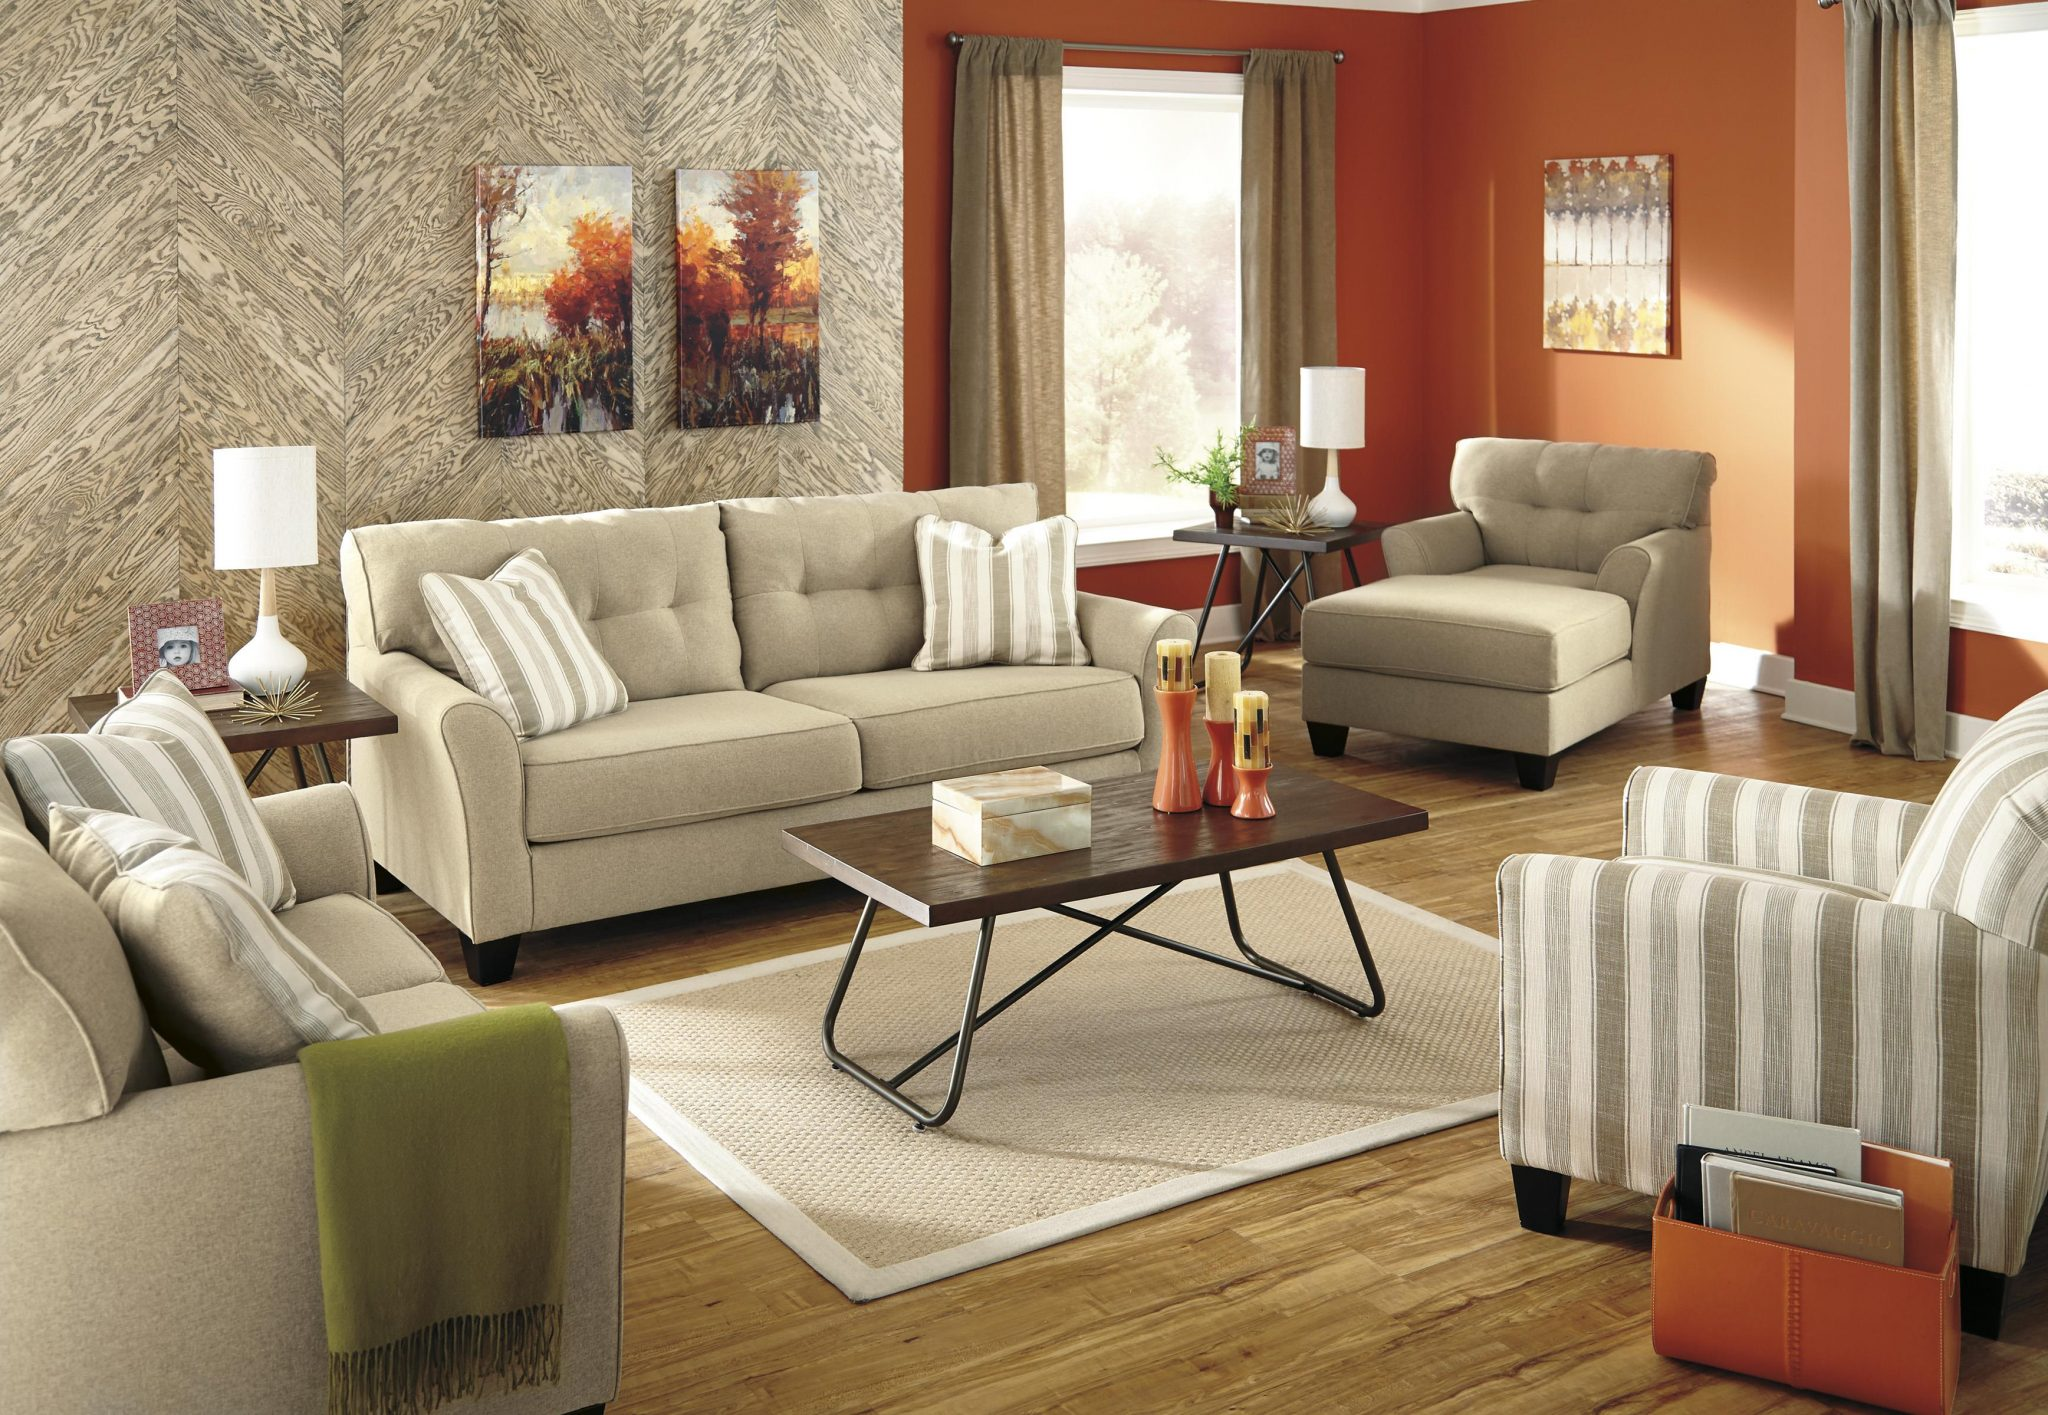 Industry Size Furniture Saudi Arabia